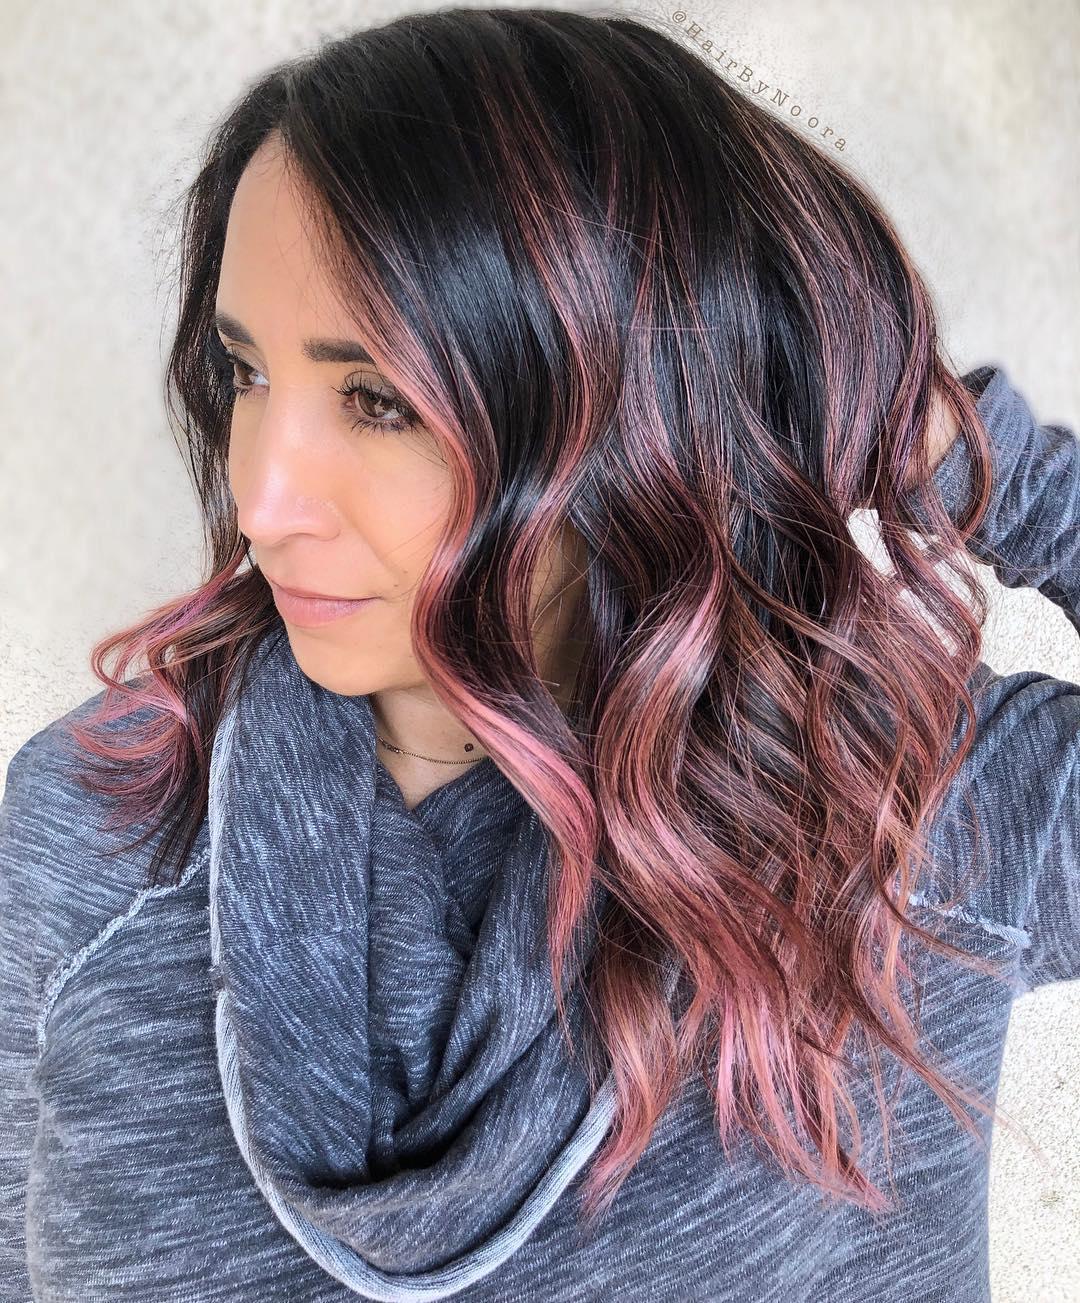 Dark Chocolate Hair With Pink Highlights